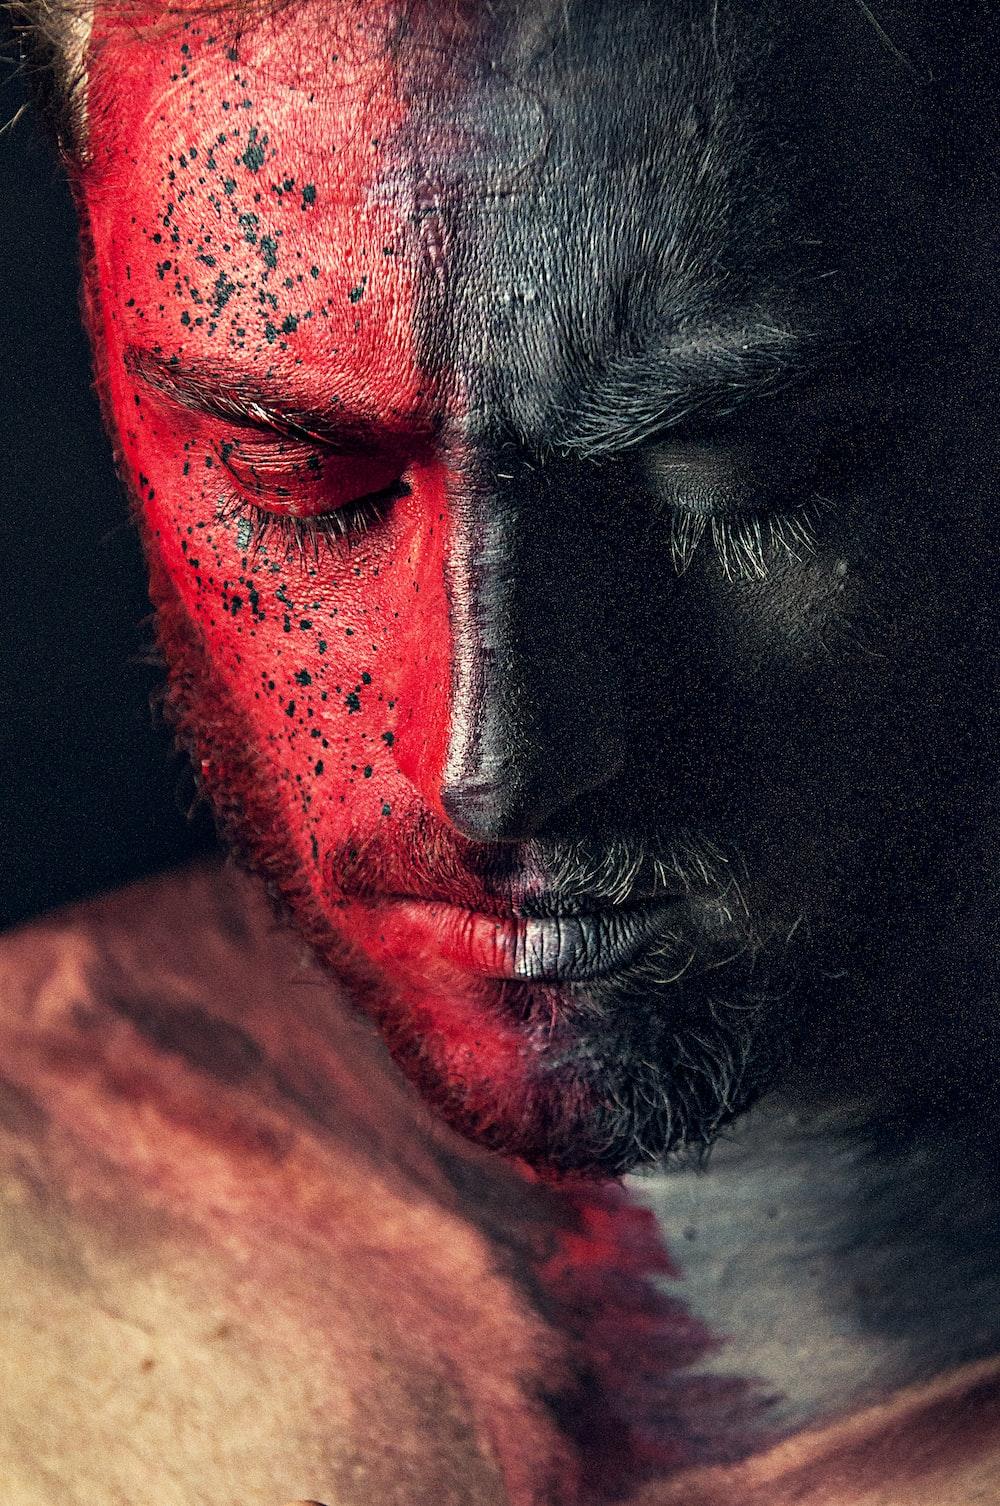 man portrait red and black paint